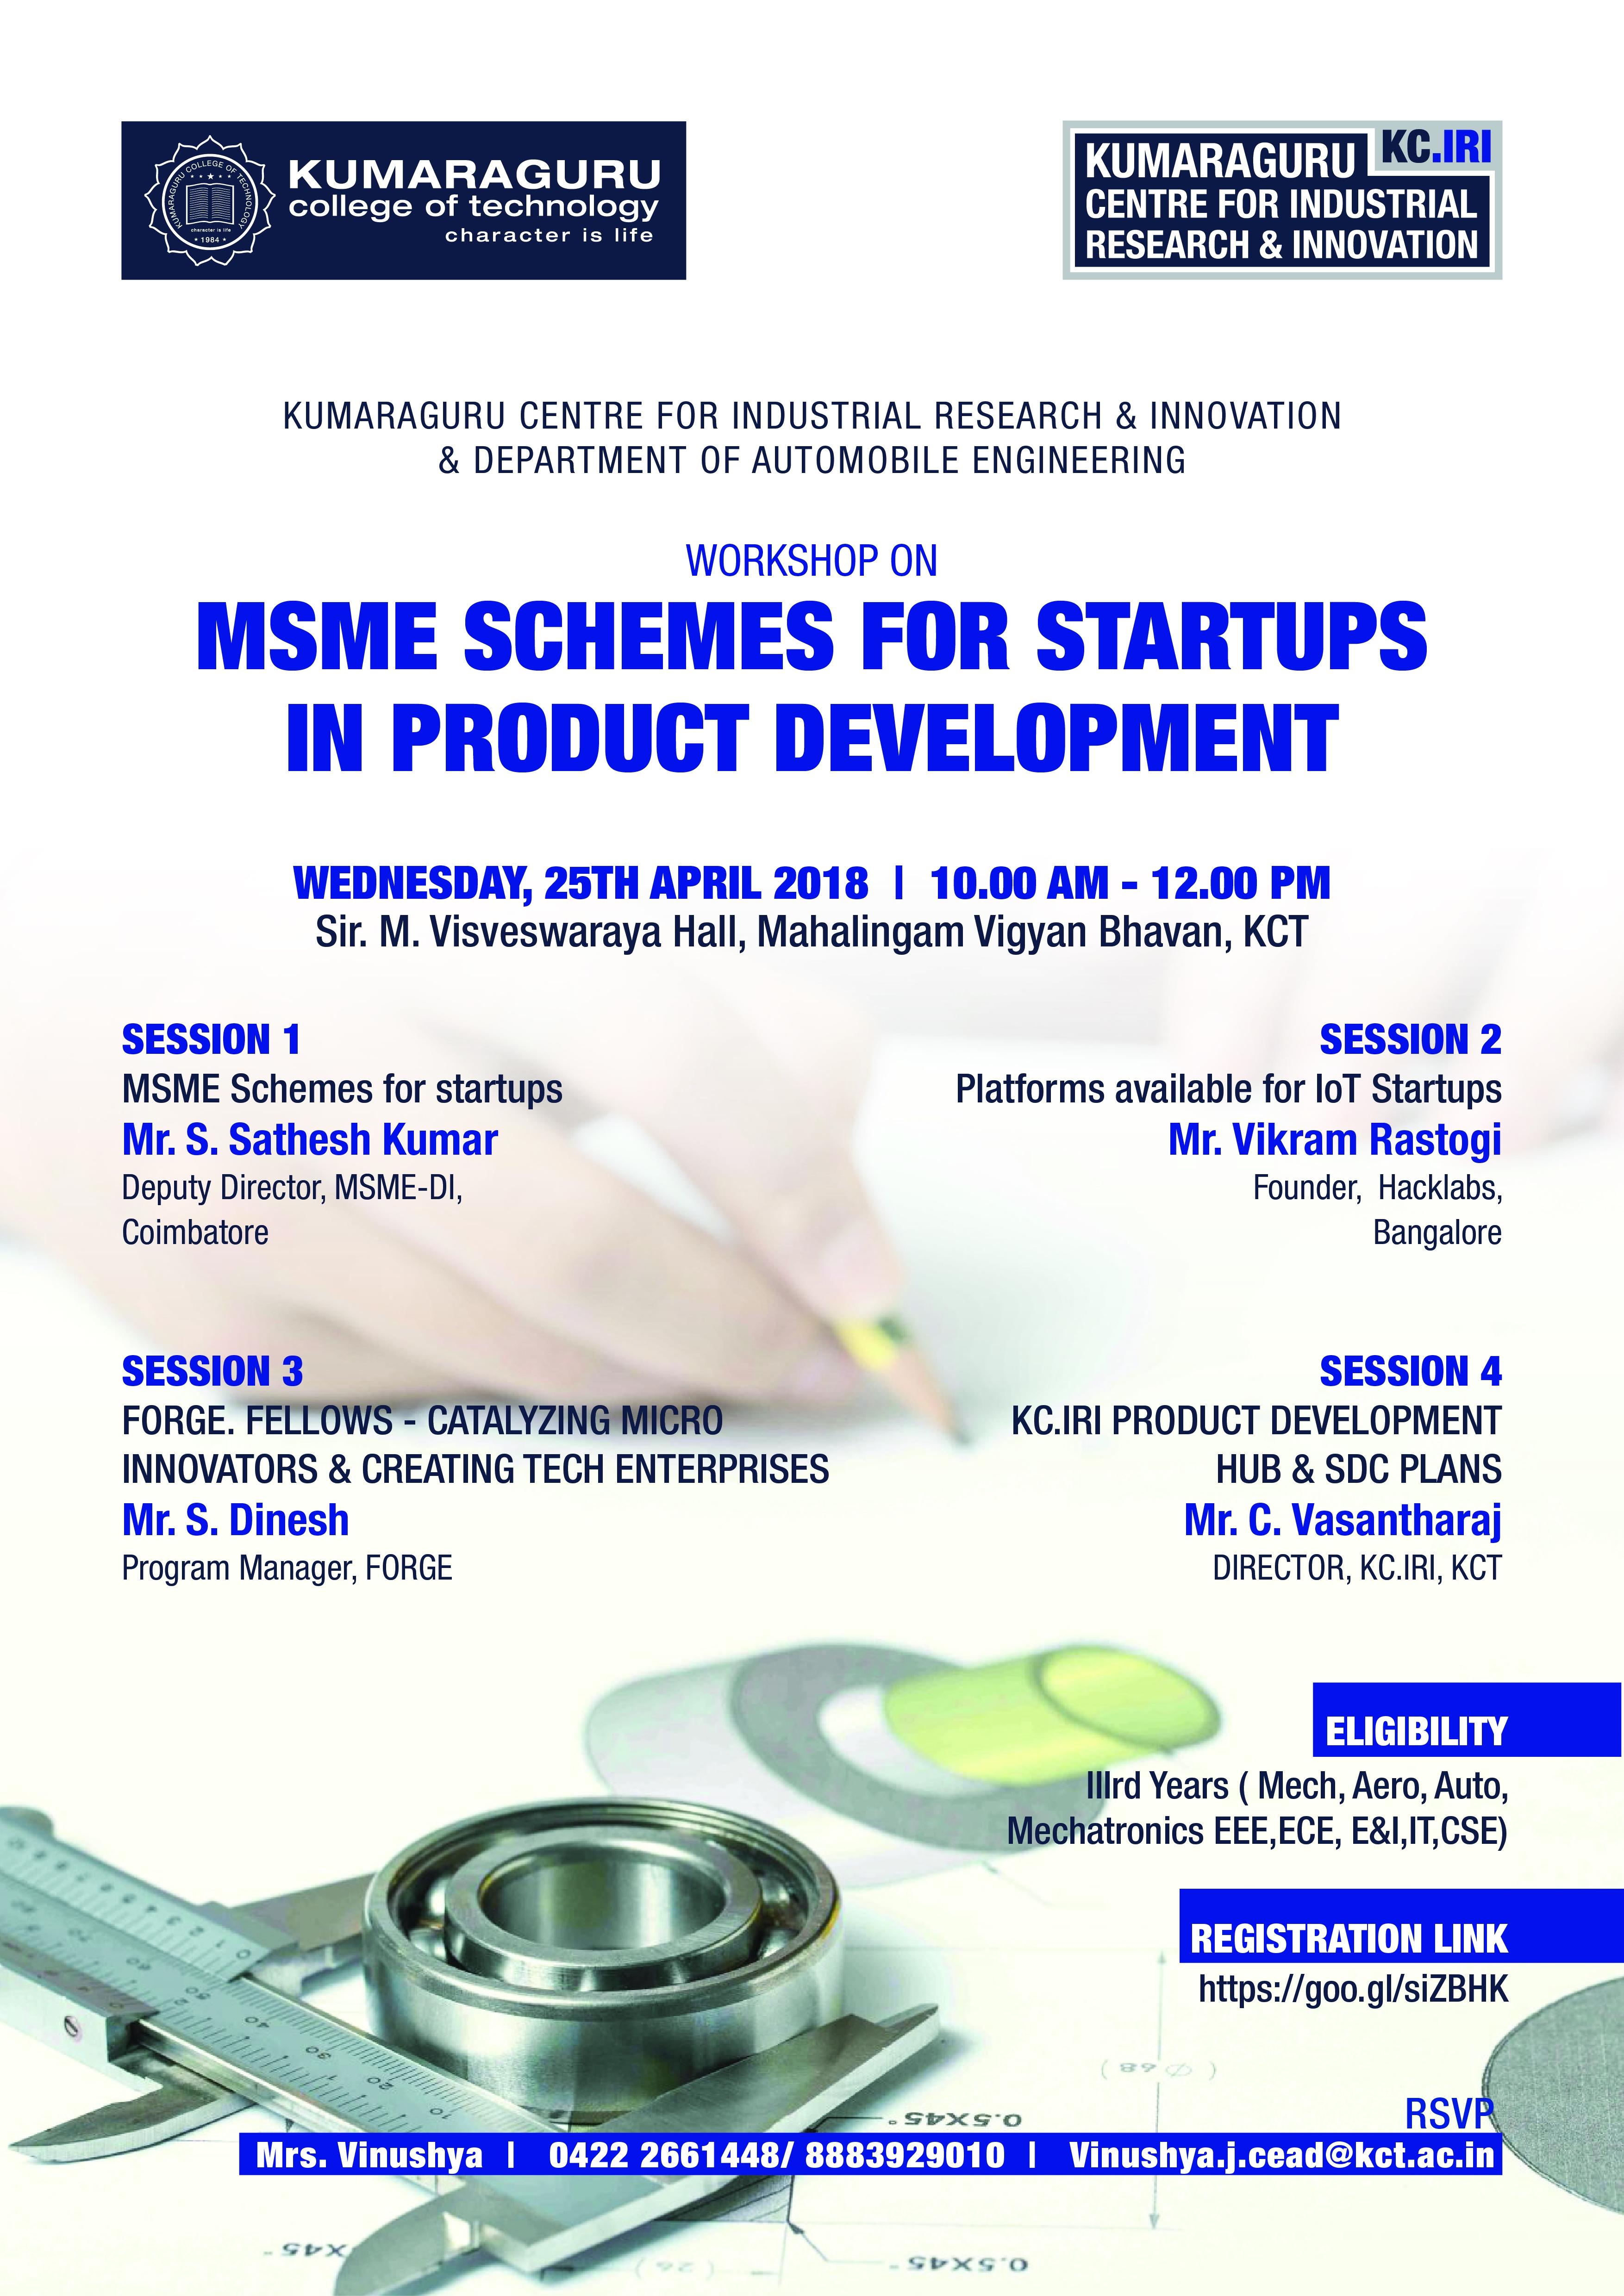 Workshop on MSME Schemes for Product Development Startups - 25.04.2018